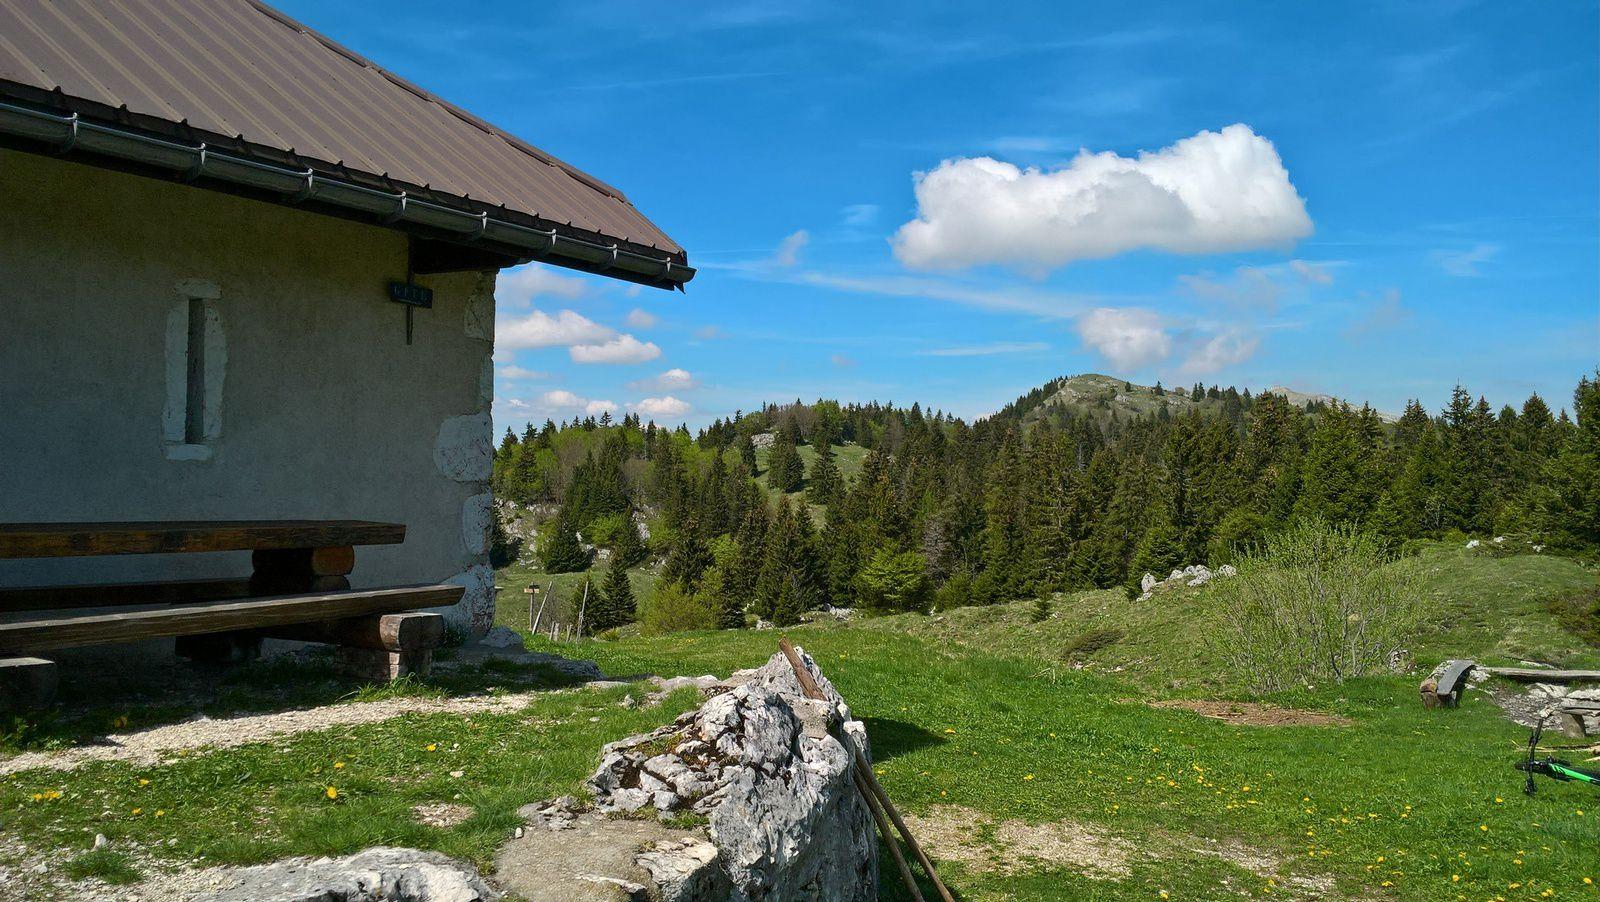 20-21 mai 2017 - VTT: pistes et trails du Jura gessien